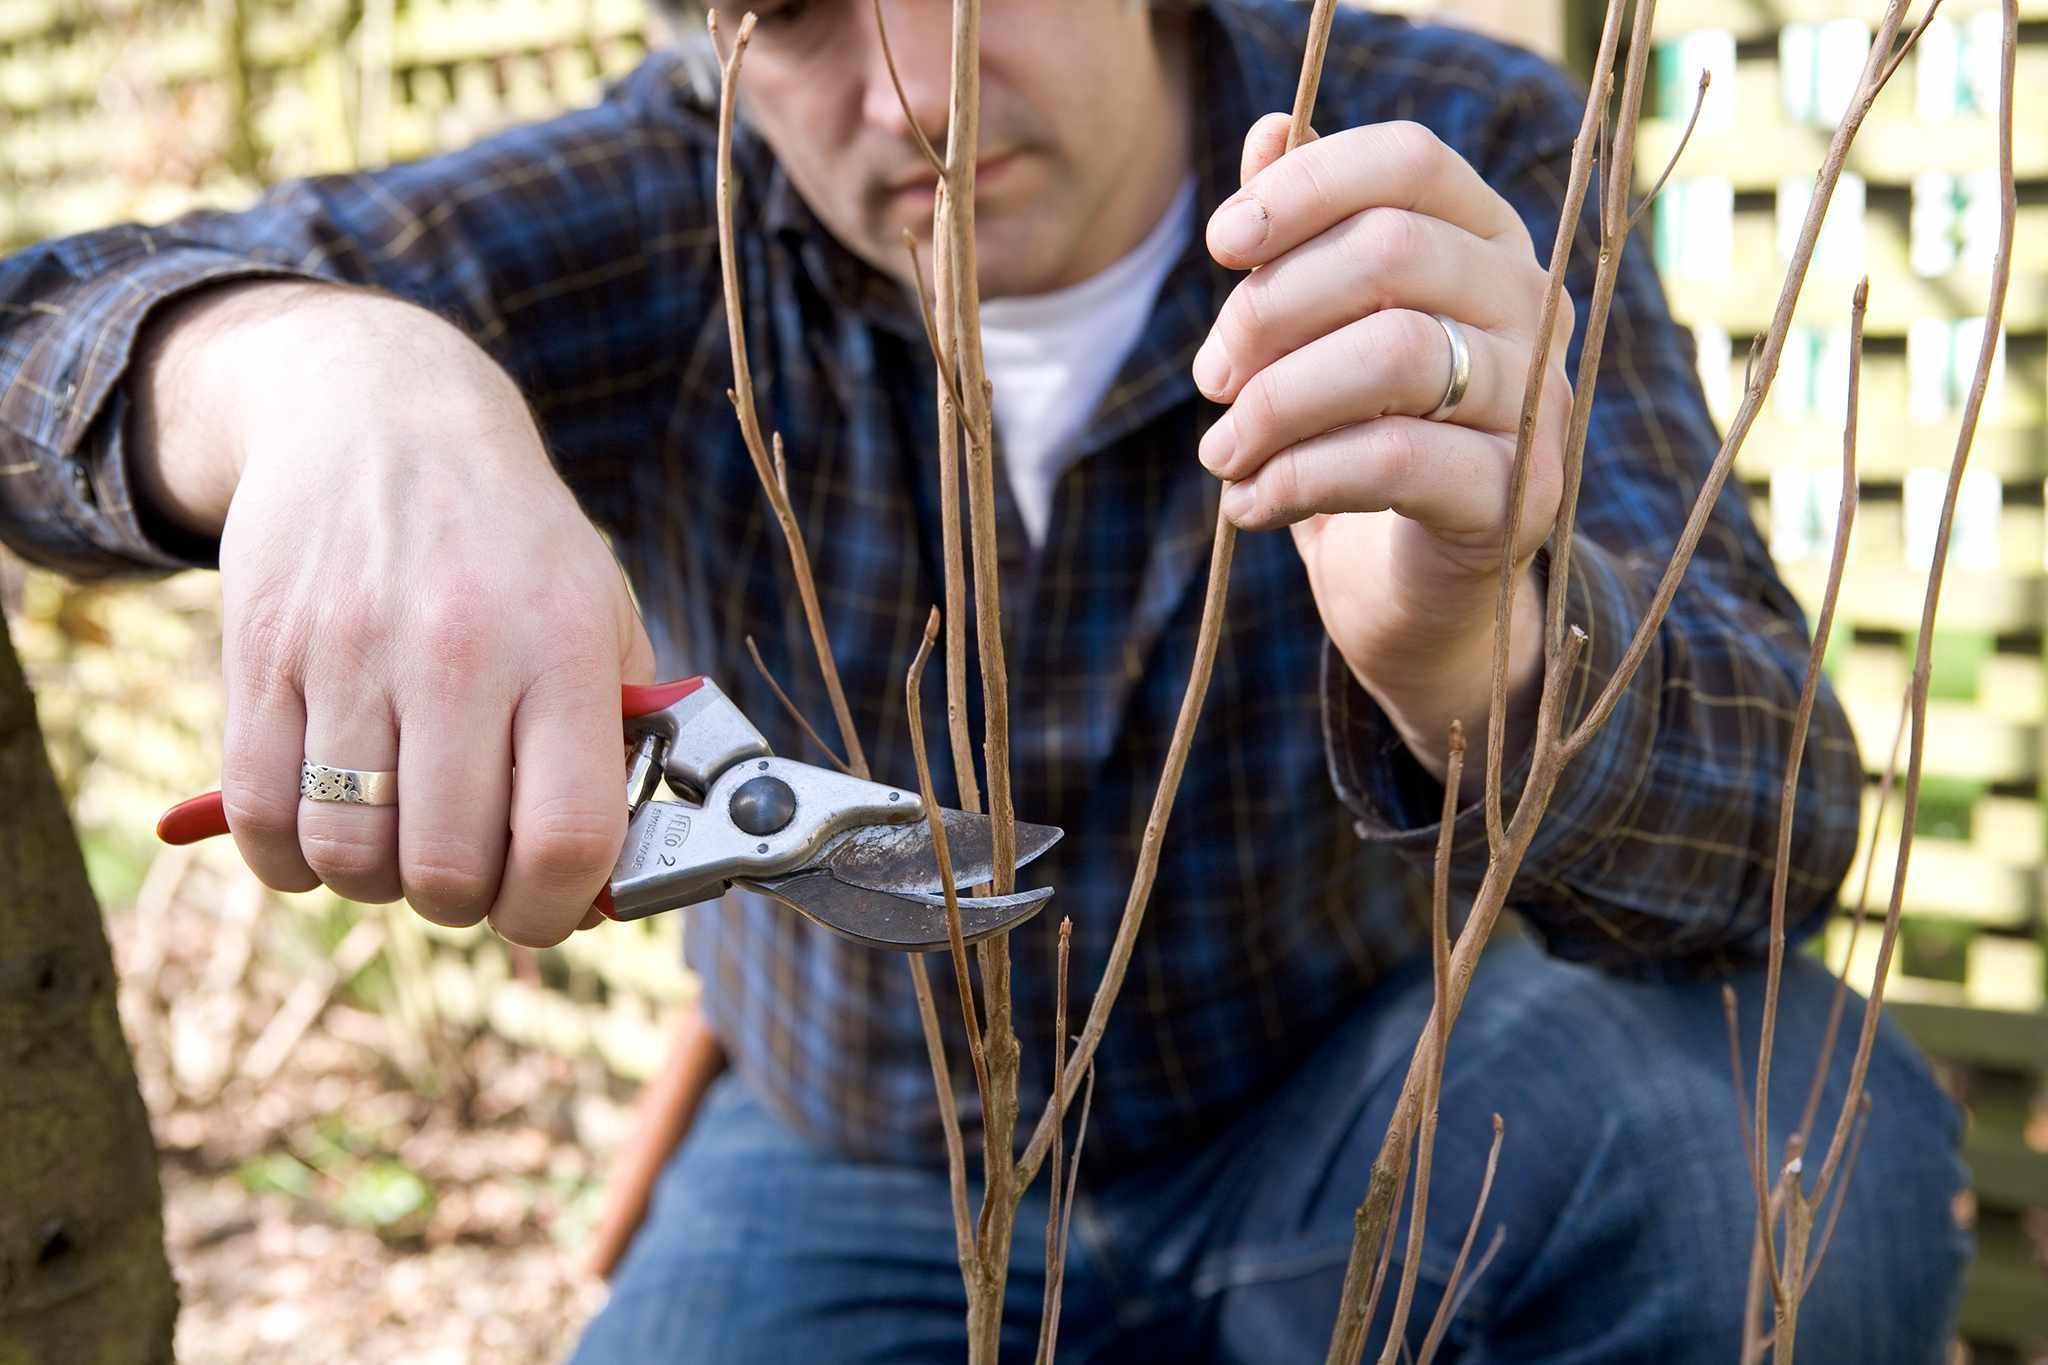 Pruning a new shrub